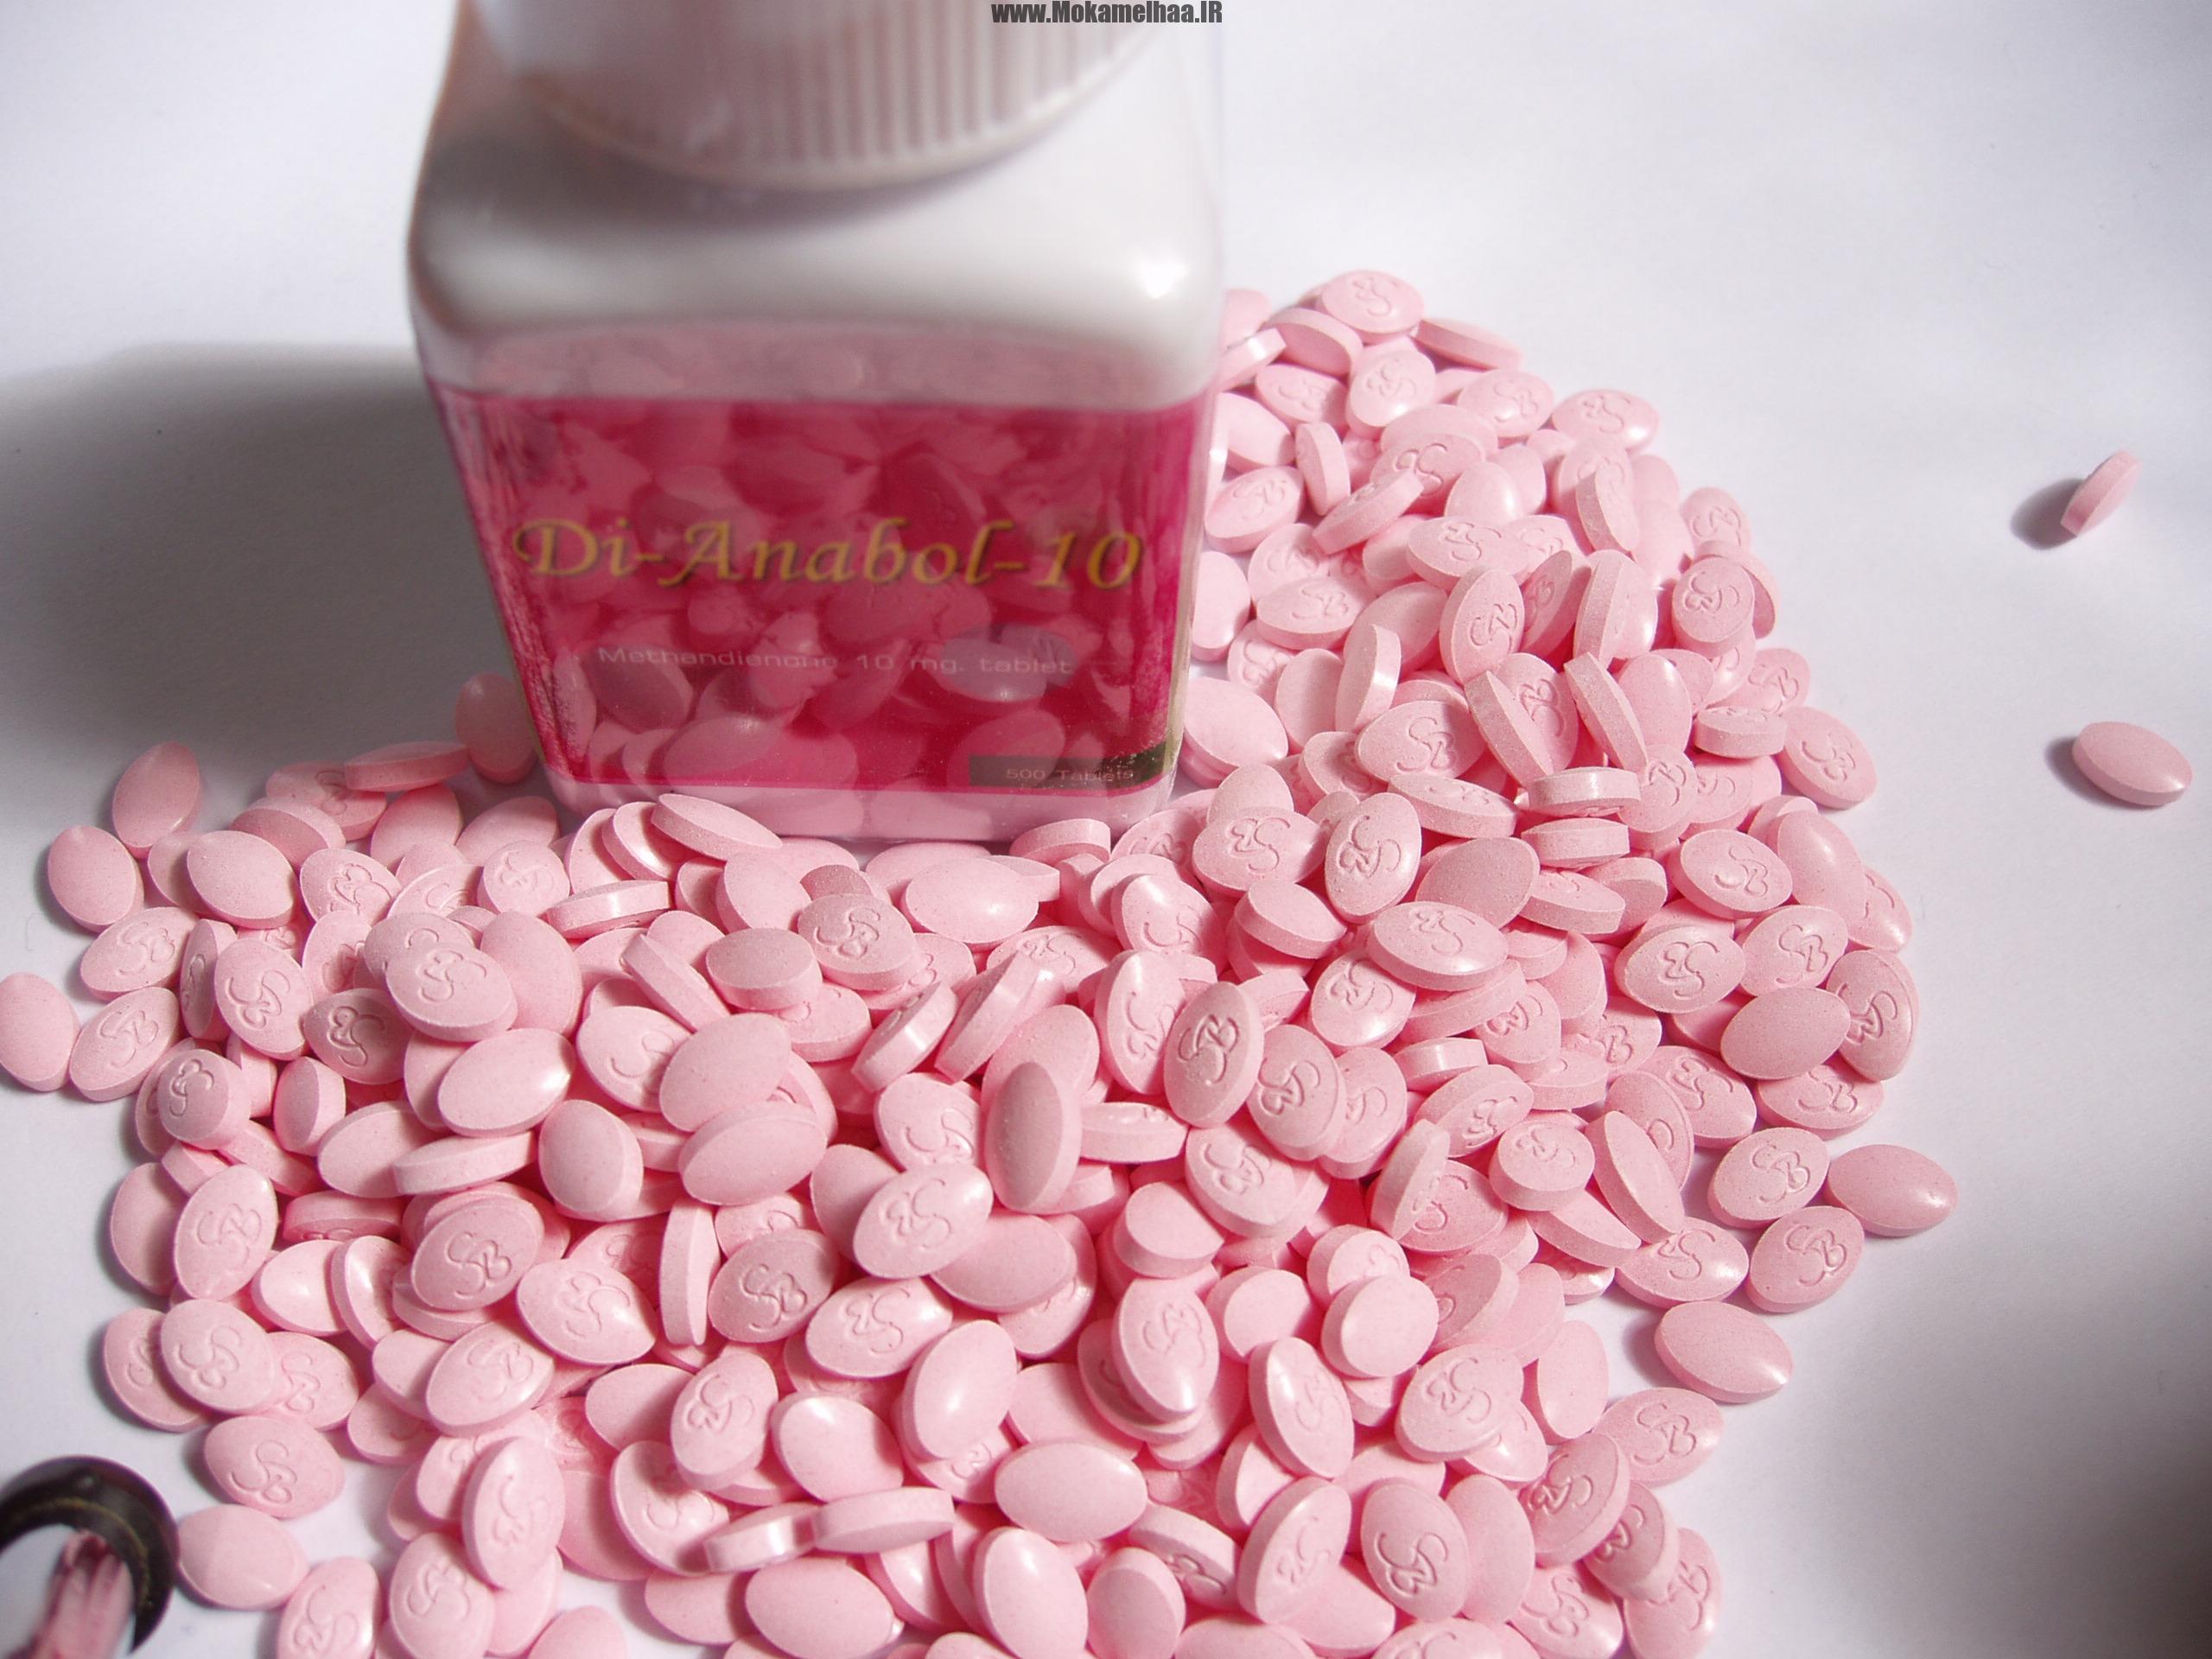 winstrol pills 25 mg